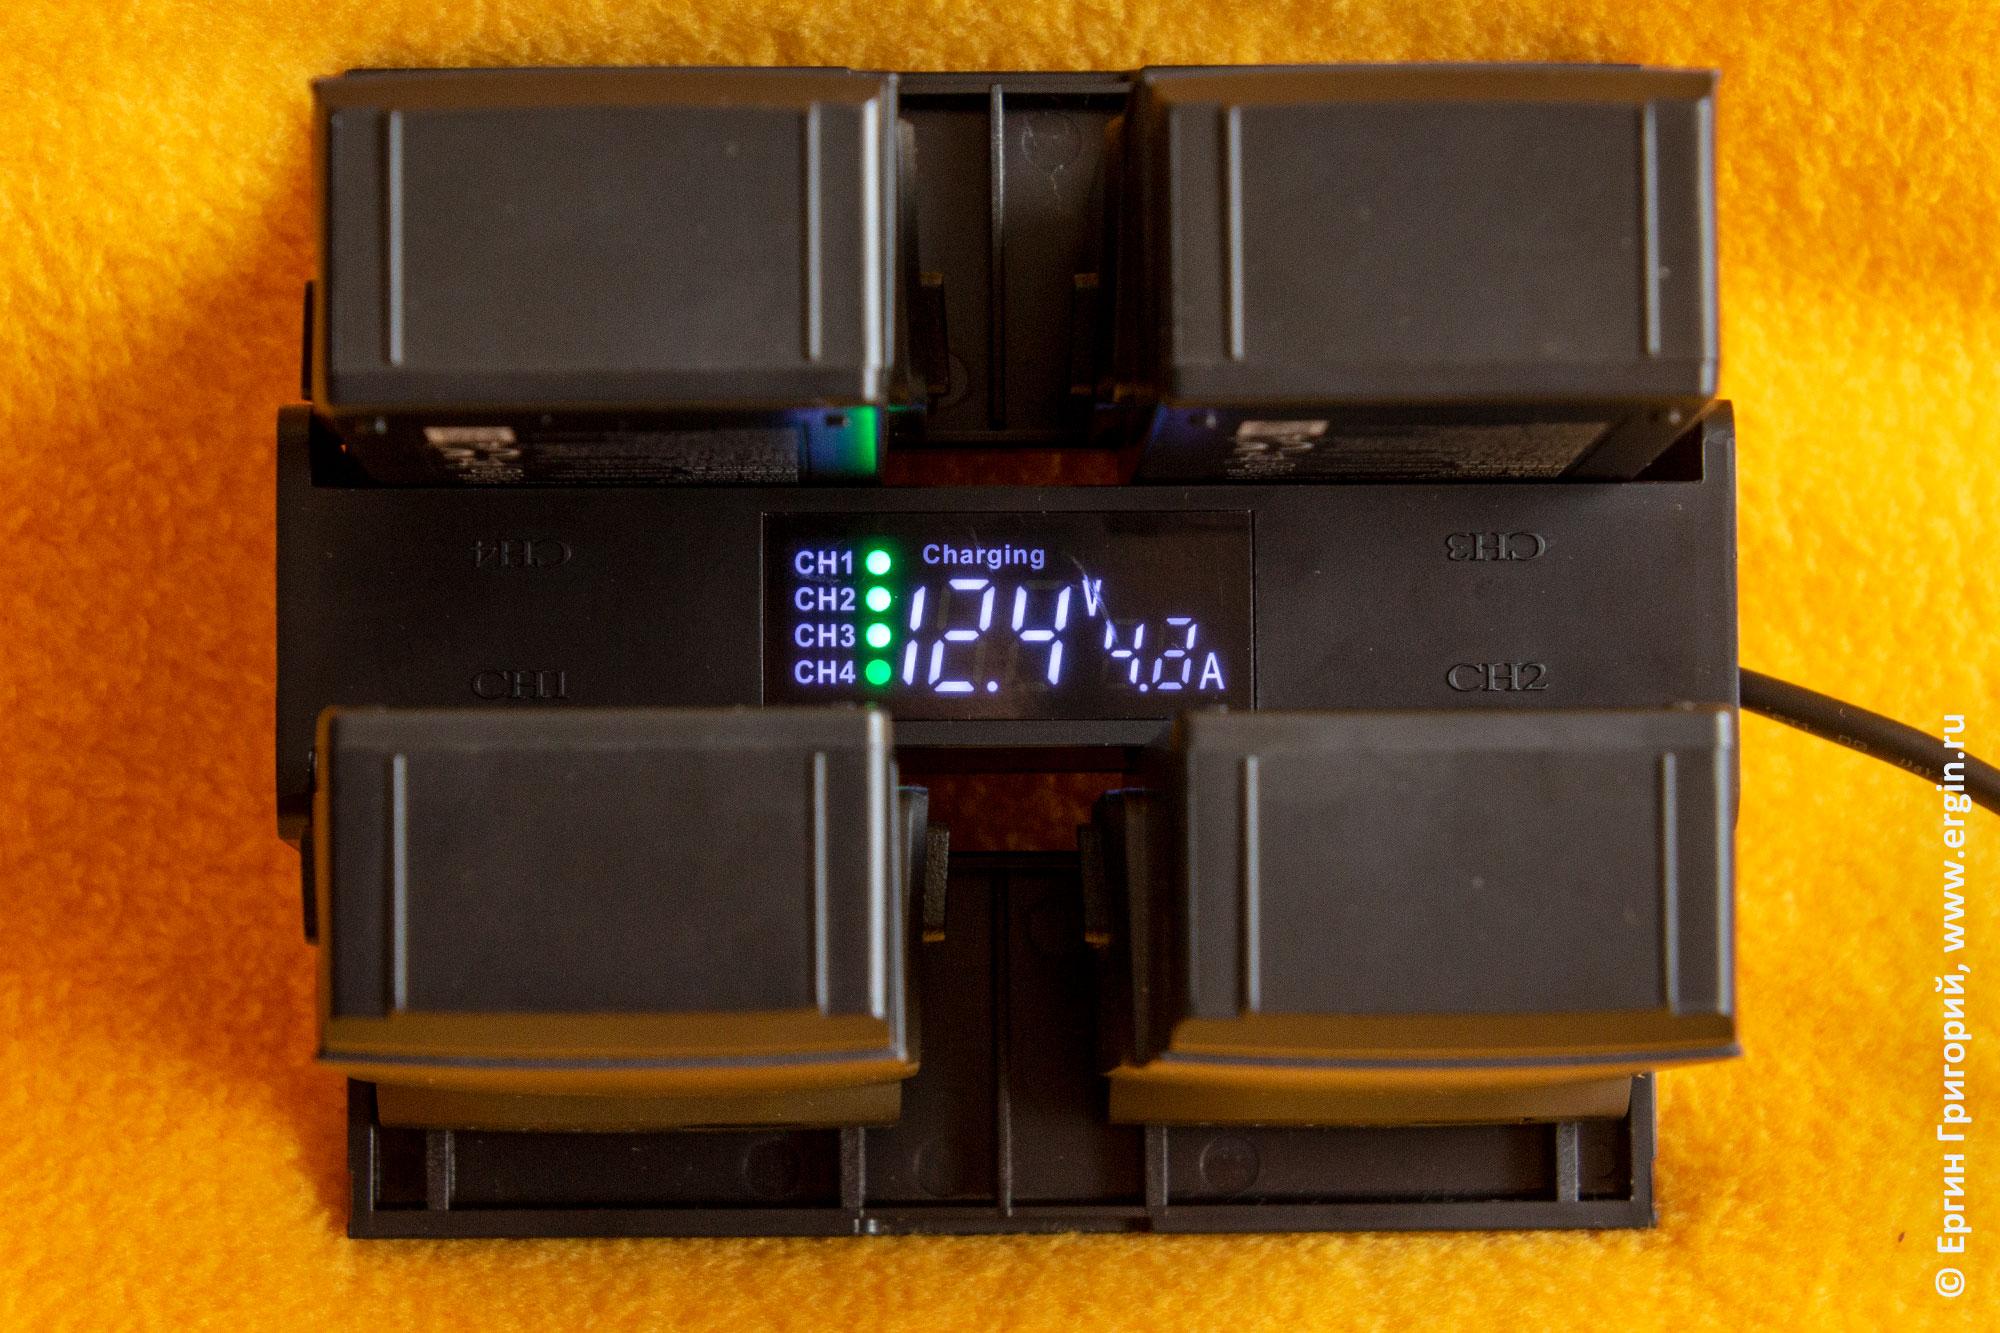 Зарядный хаб DJI Mavic Air  цифровое табло и анализатор тестер аккумуляторов